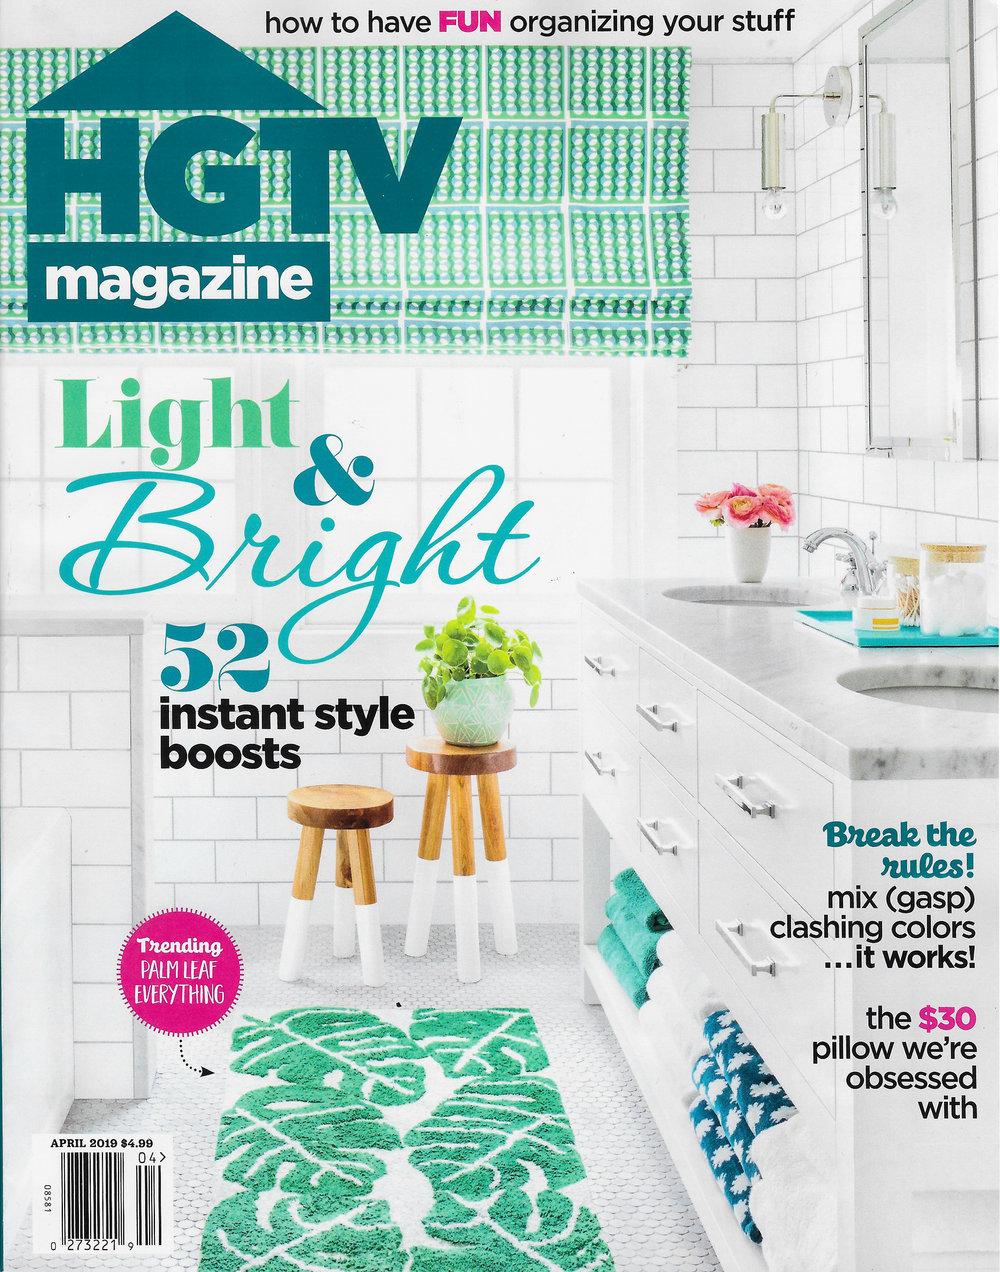 COVER - HGTV Magazine - April 2019